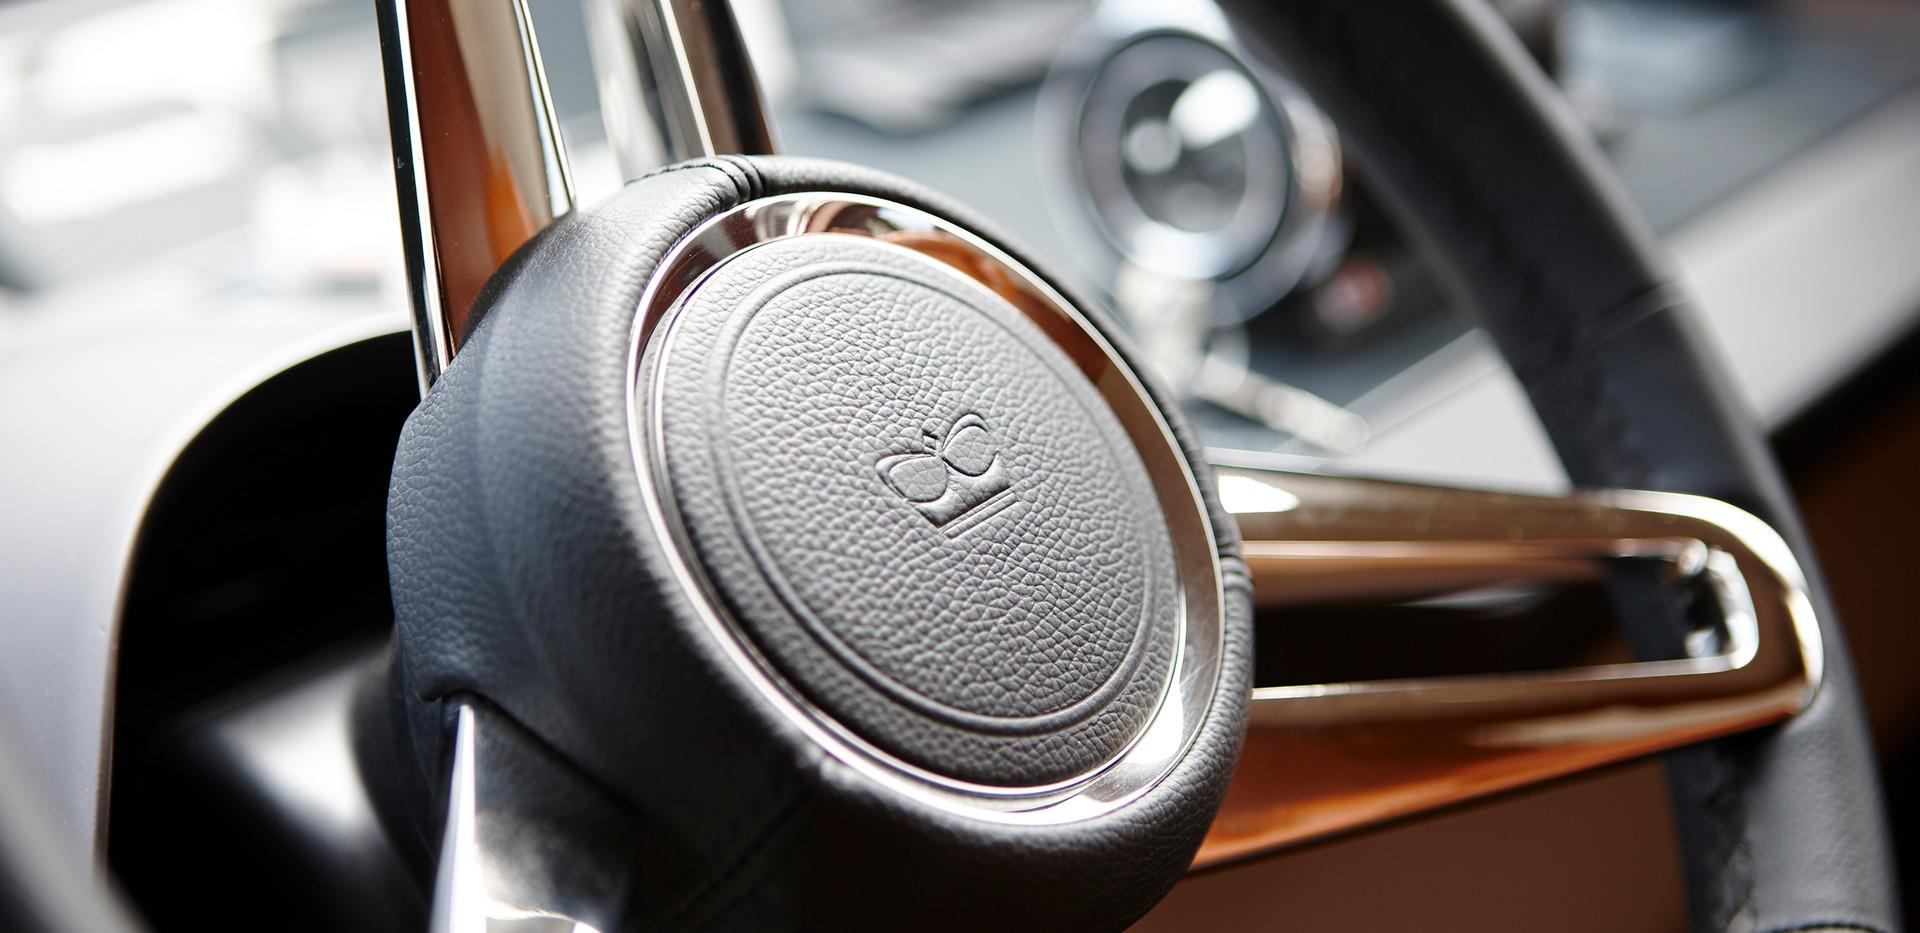 88-motor-yacht-interior-helm-wheel-detai